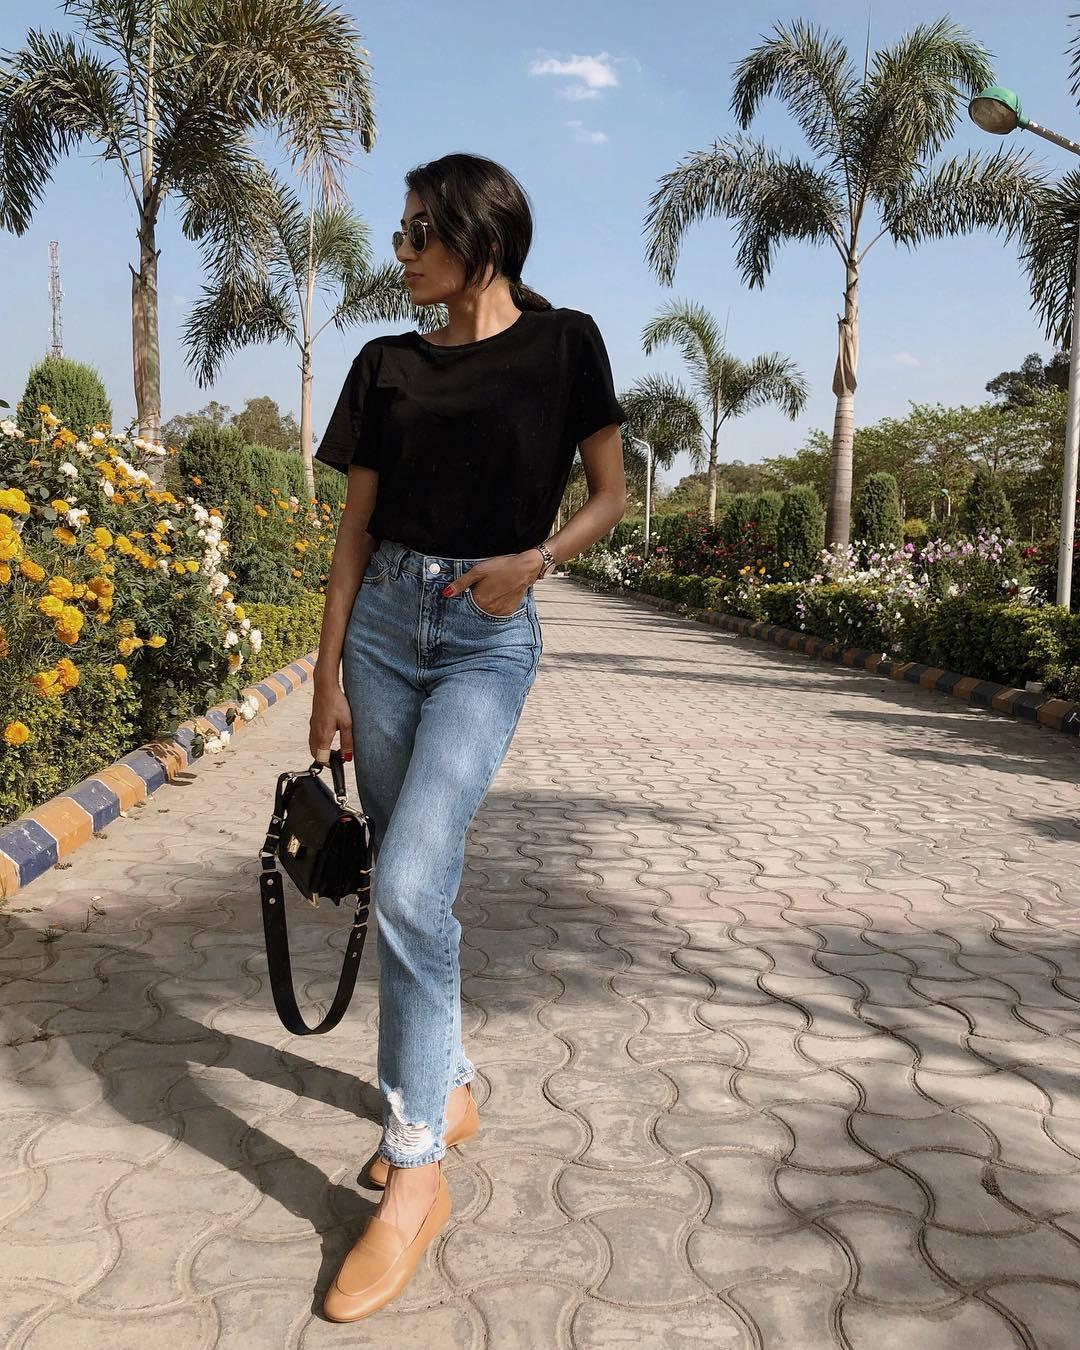 jeans high waisted jeans mom jeans topshop loafers black t-shirt black bag